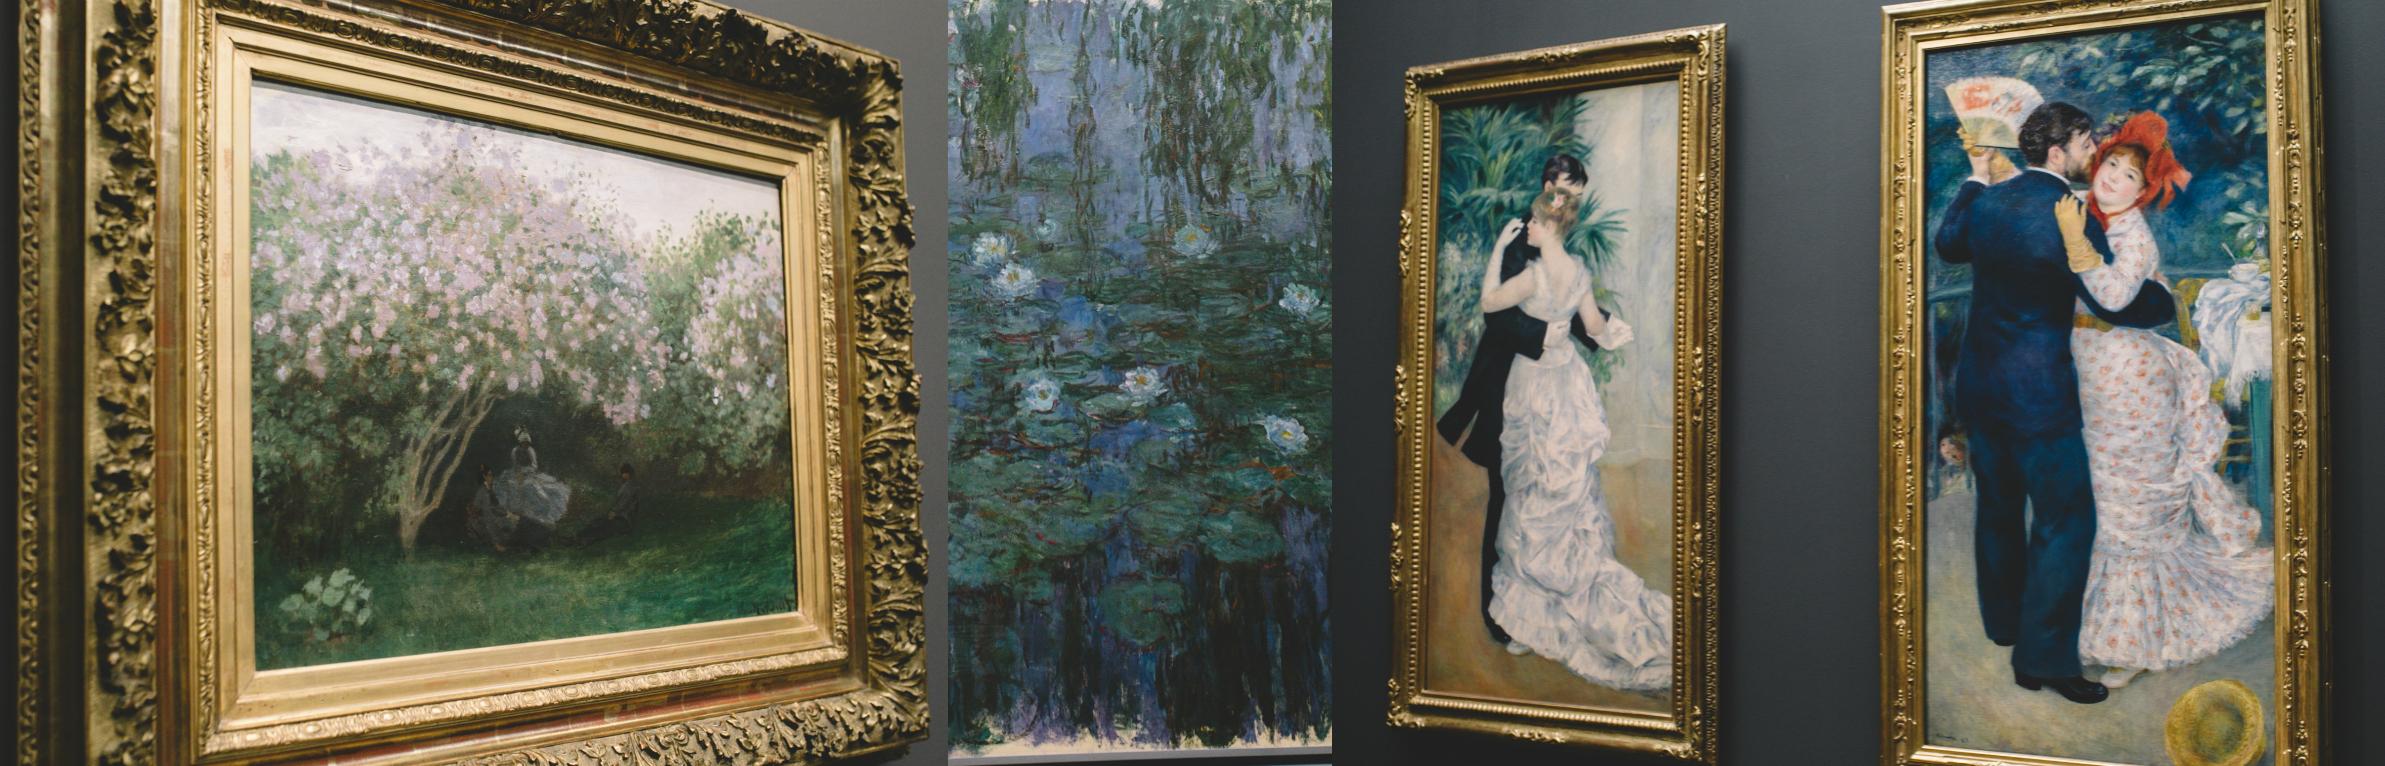 Monet Louvre.jpg